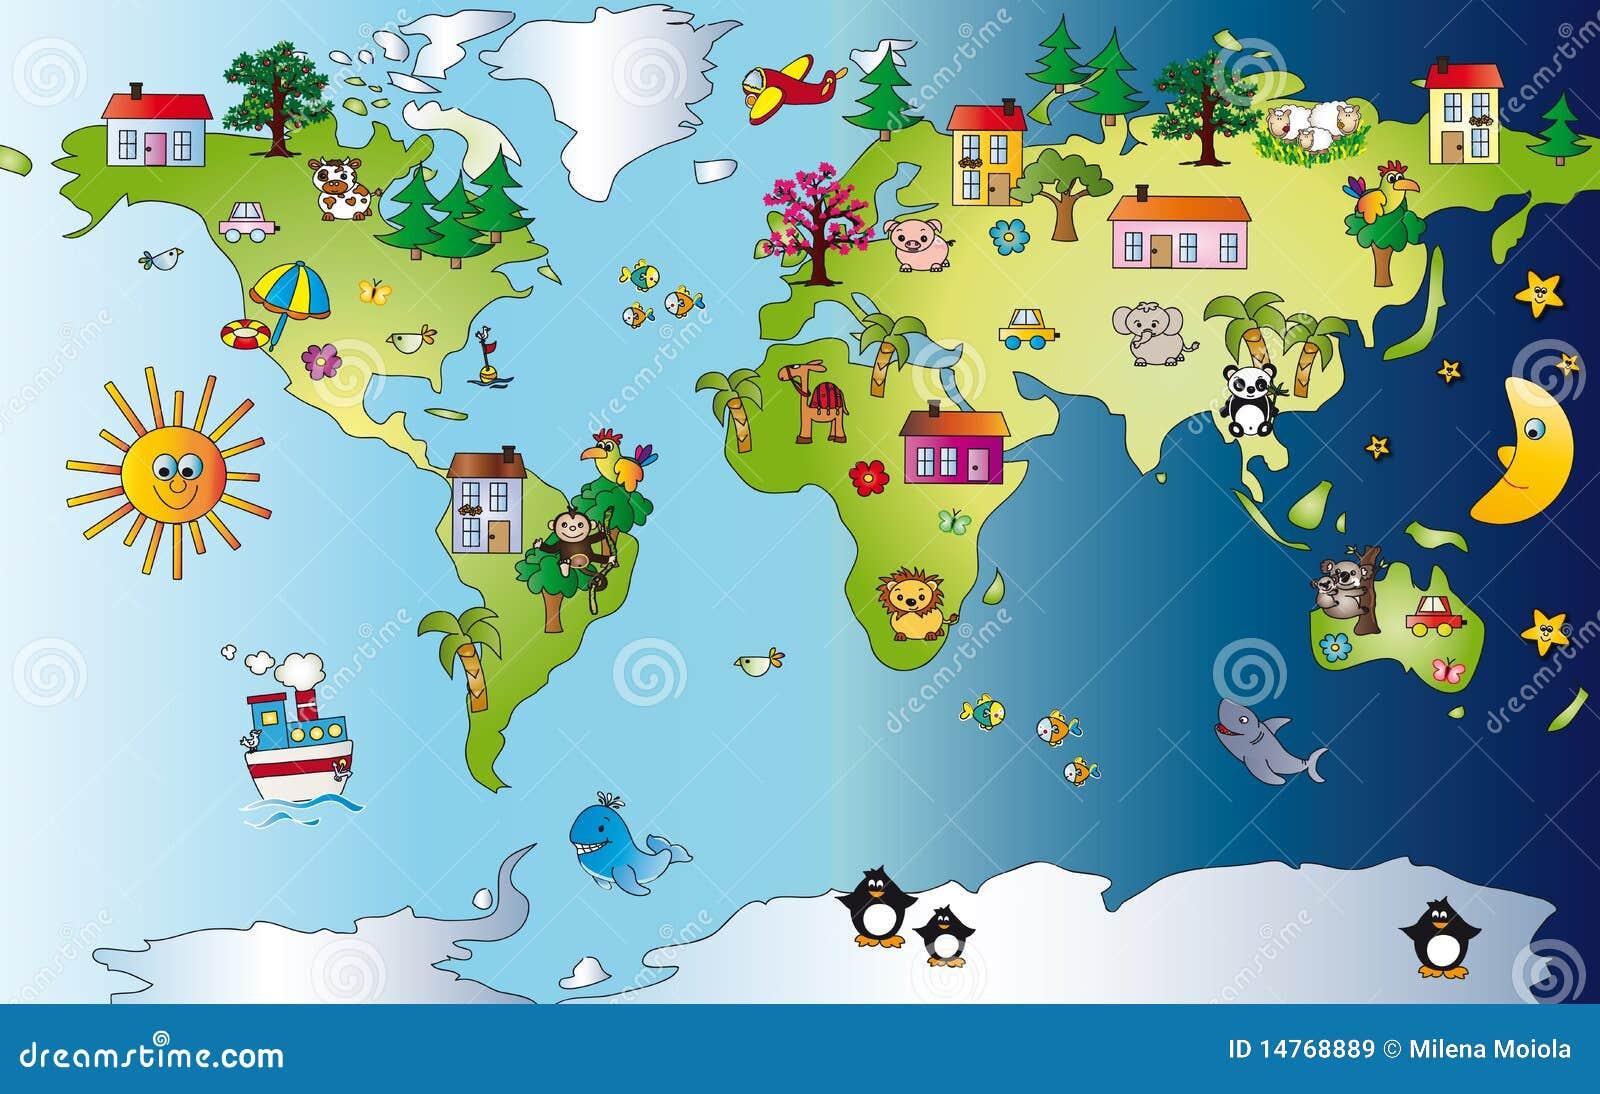 World Map Royalty Free Stock Images Image 14768889